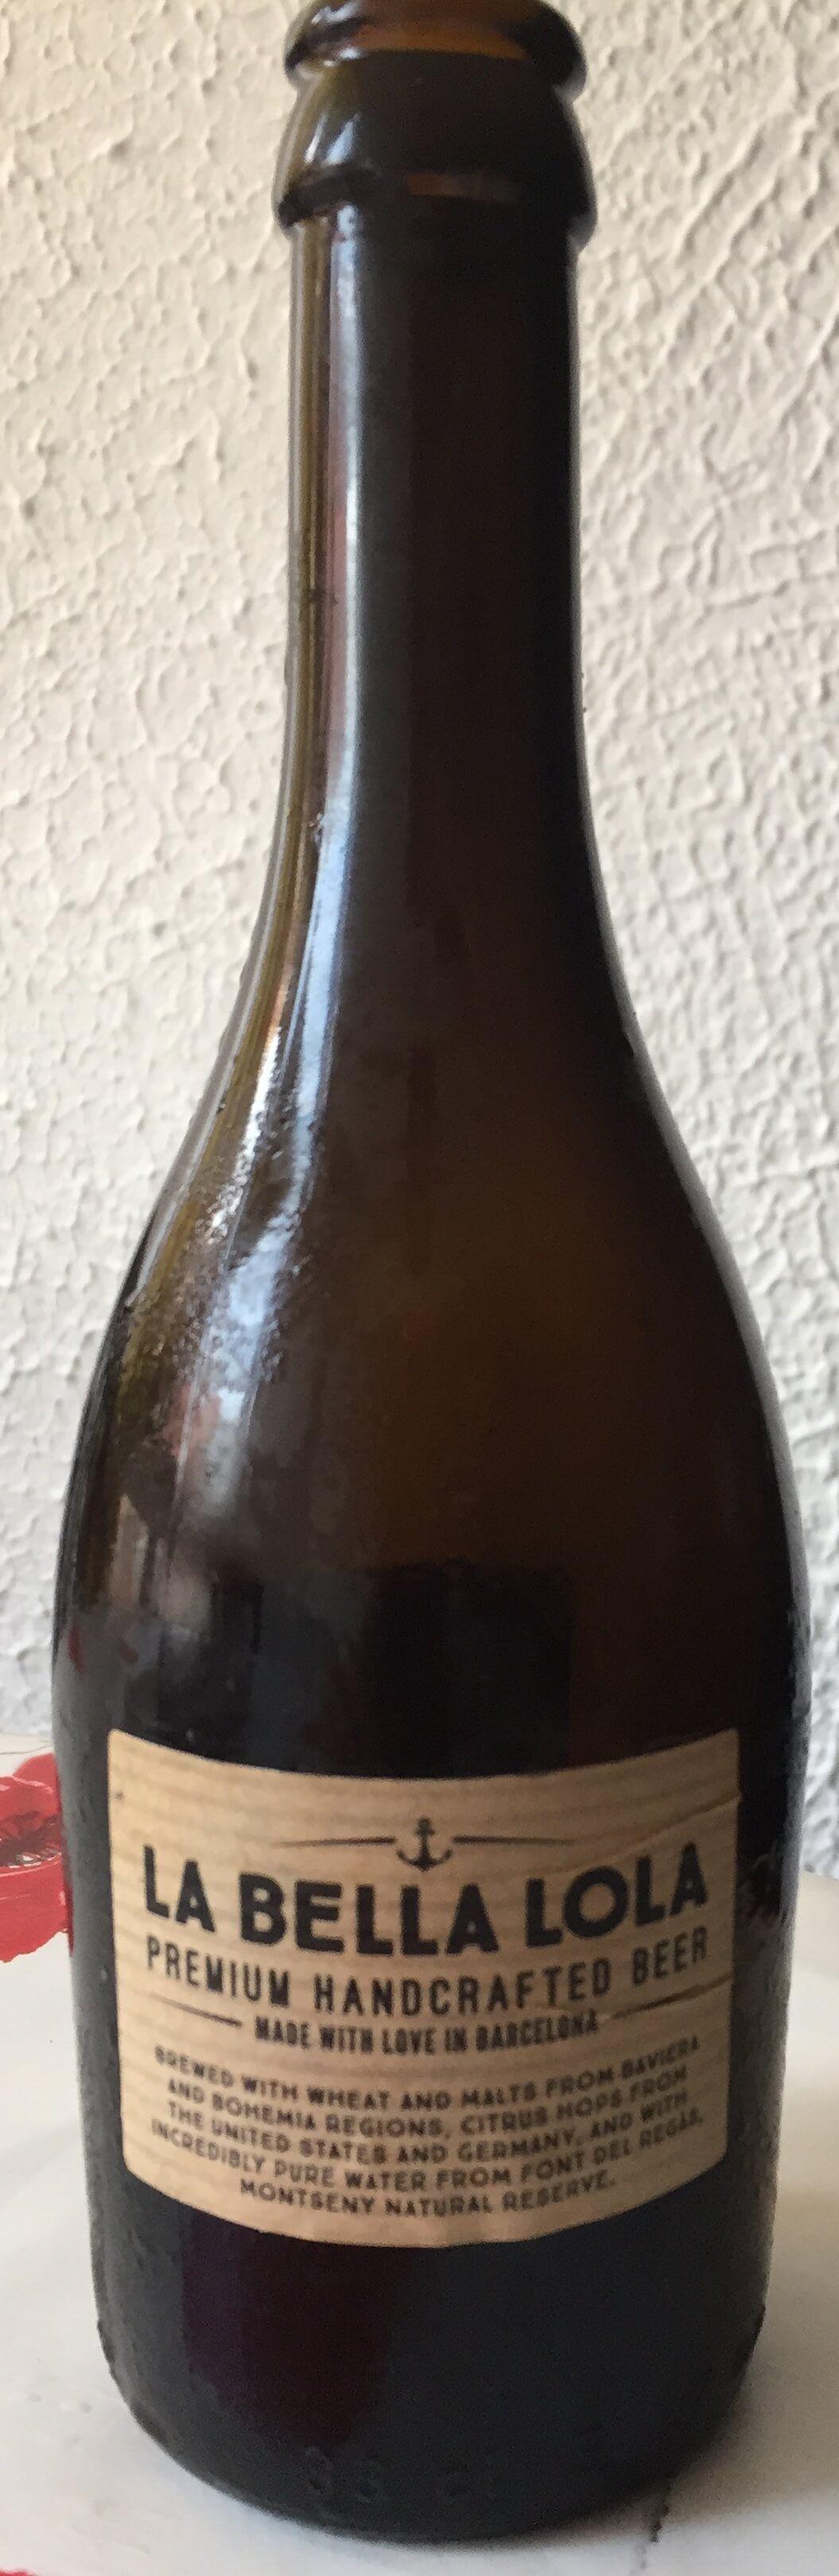 cerveza artesanal la bella lola